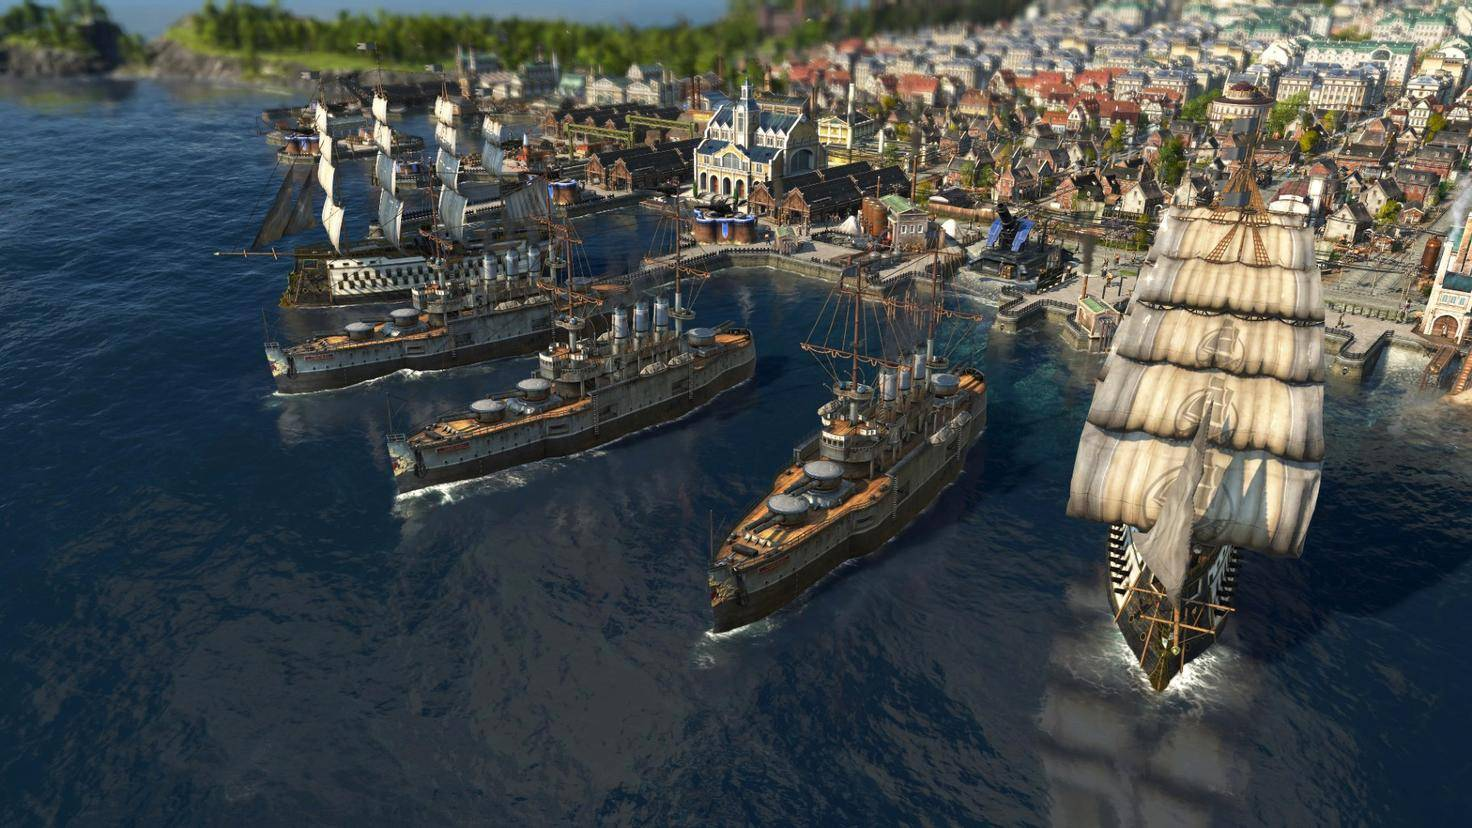 anno-1800-flotte-screenshot